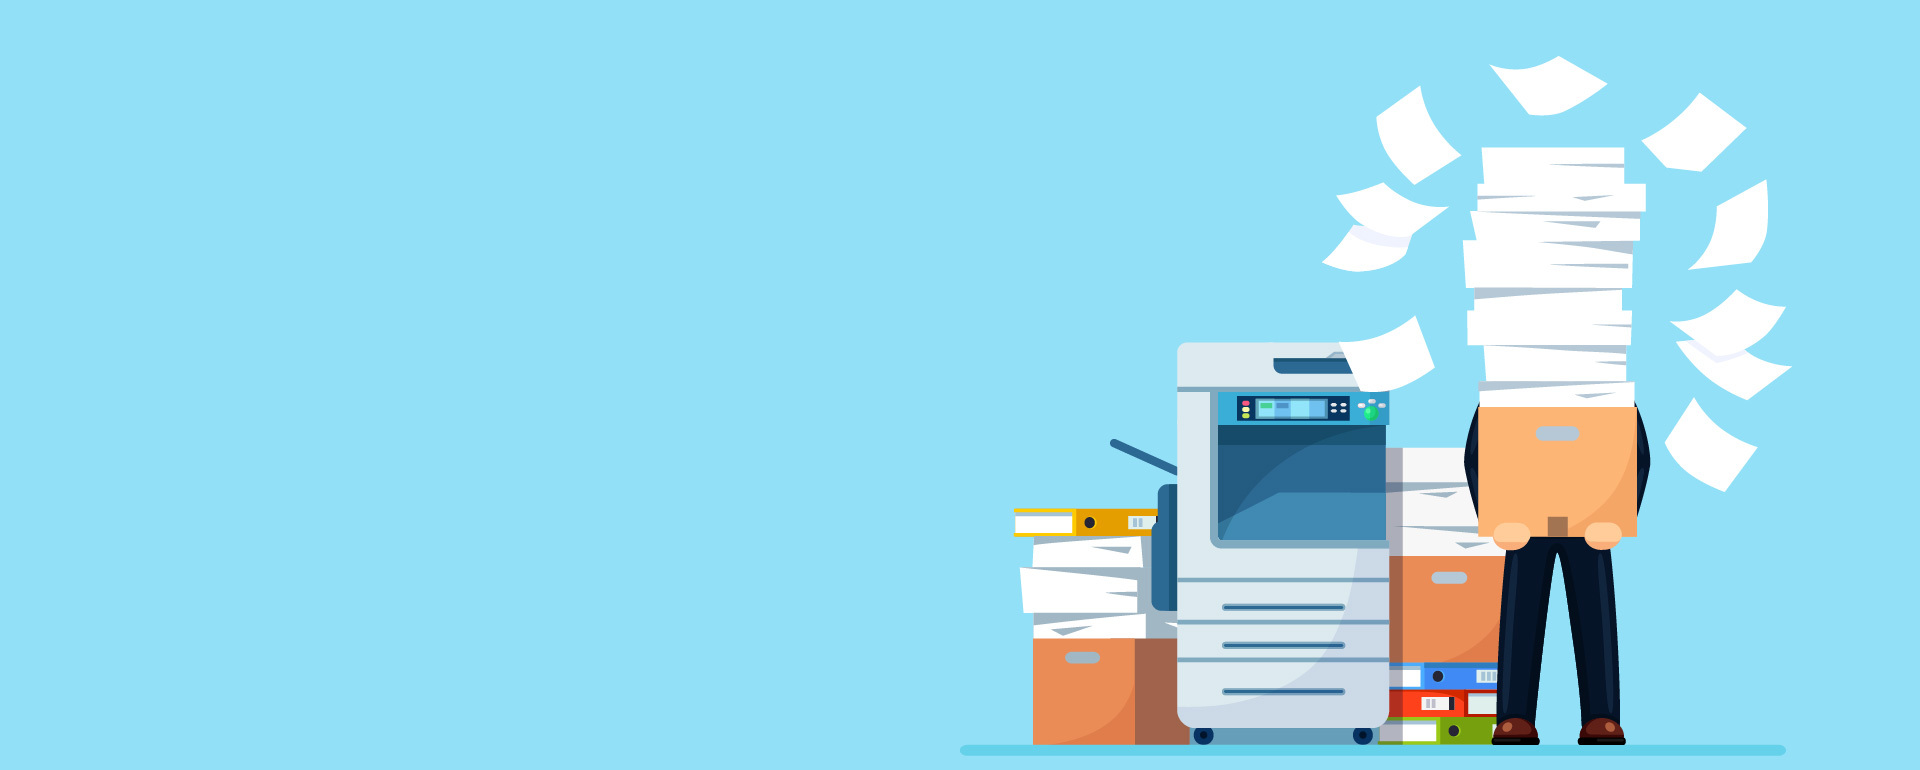 Print, Copy Scan & Laminate - Printbox london -Same day Printing services near me